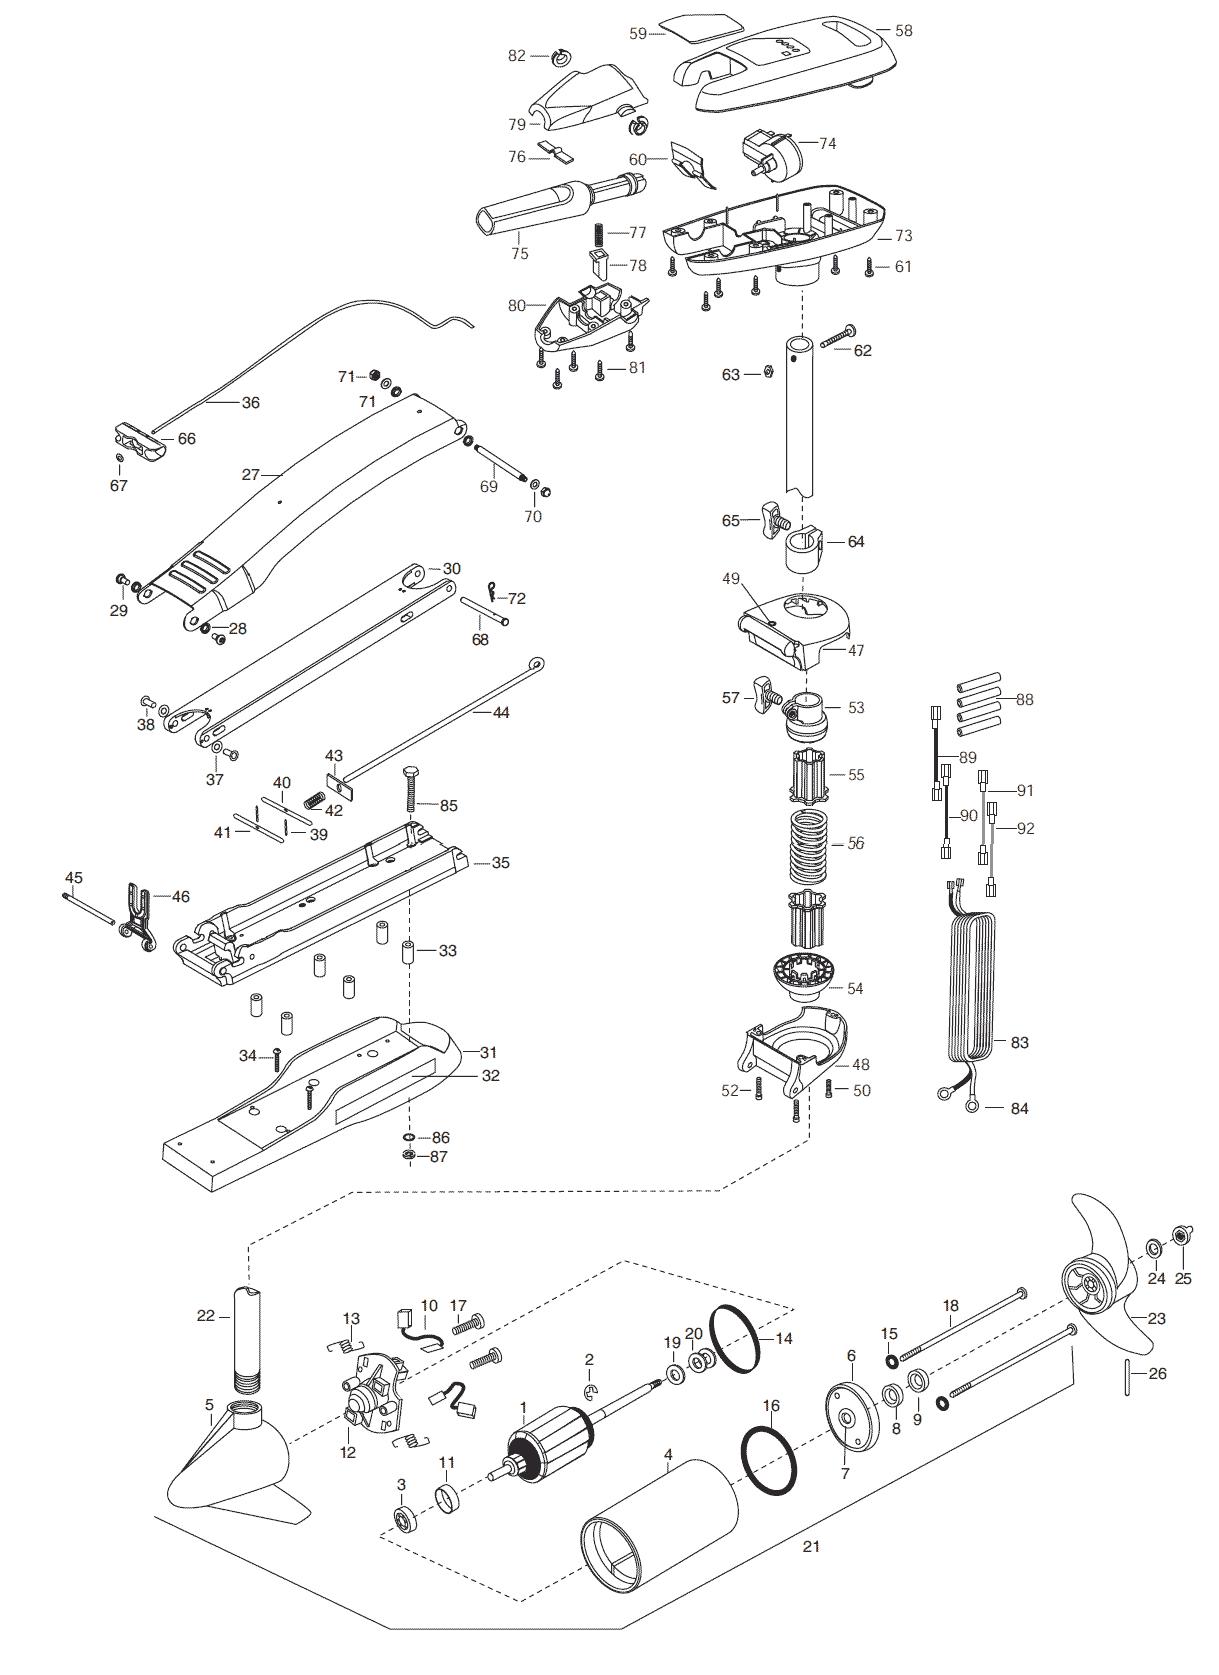 minn kota riptide 55 sc b 52 inch parts 2003 from fish307 B-52 Cutaway expand product diagram